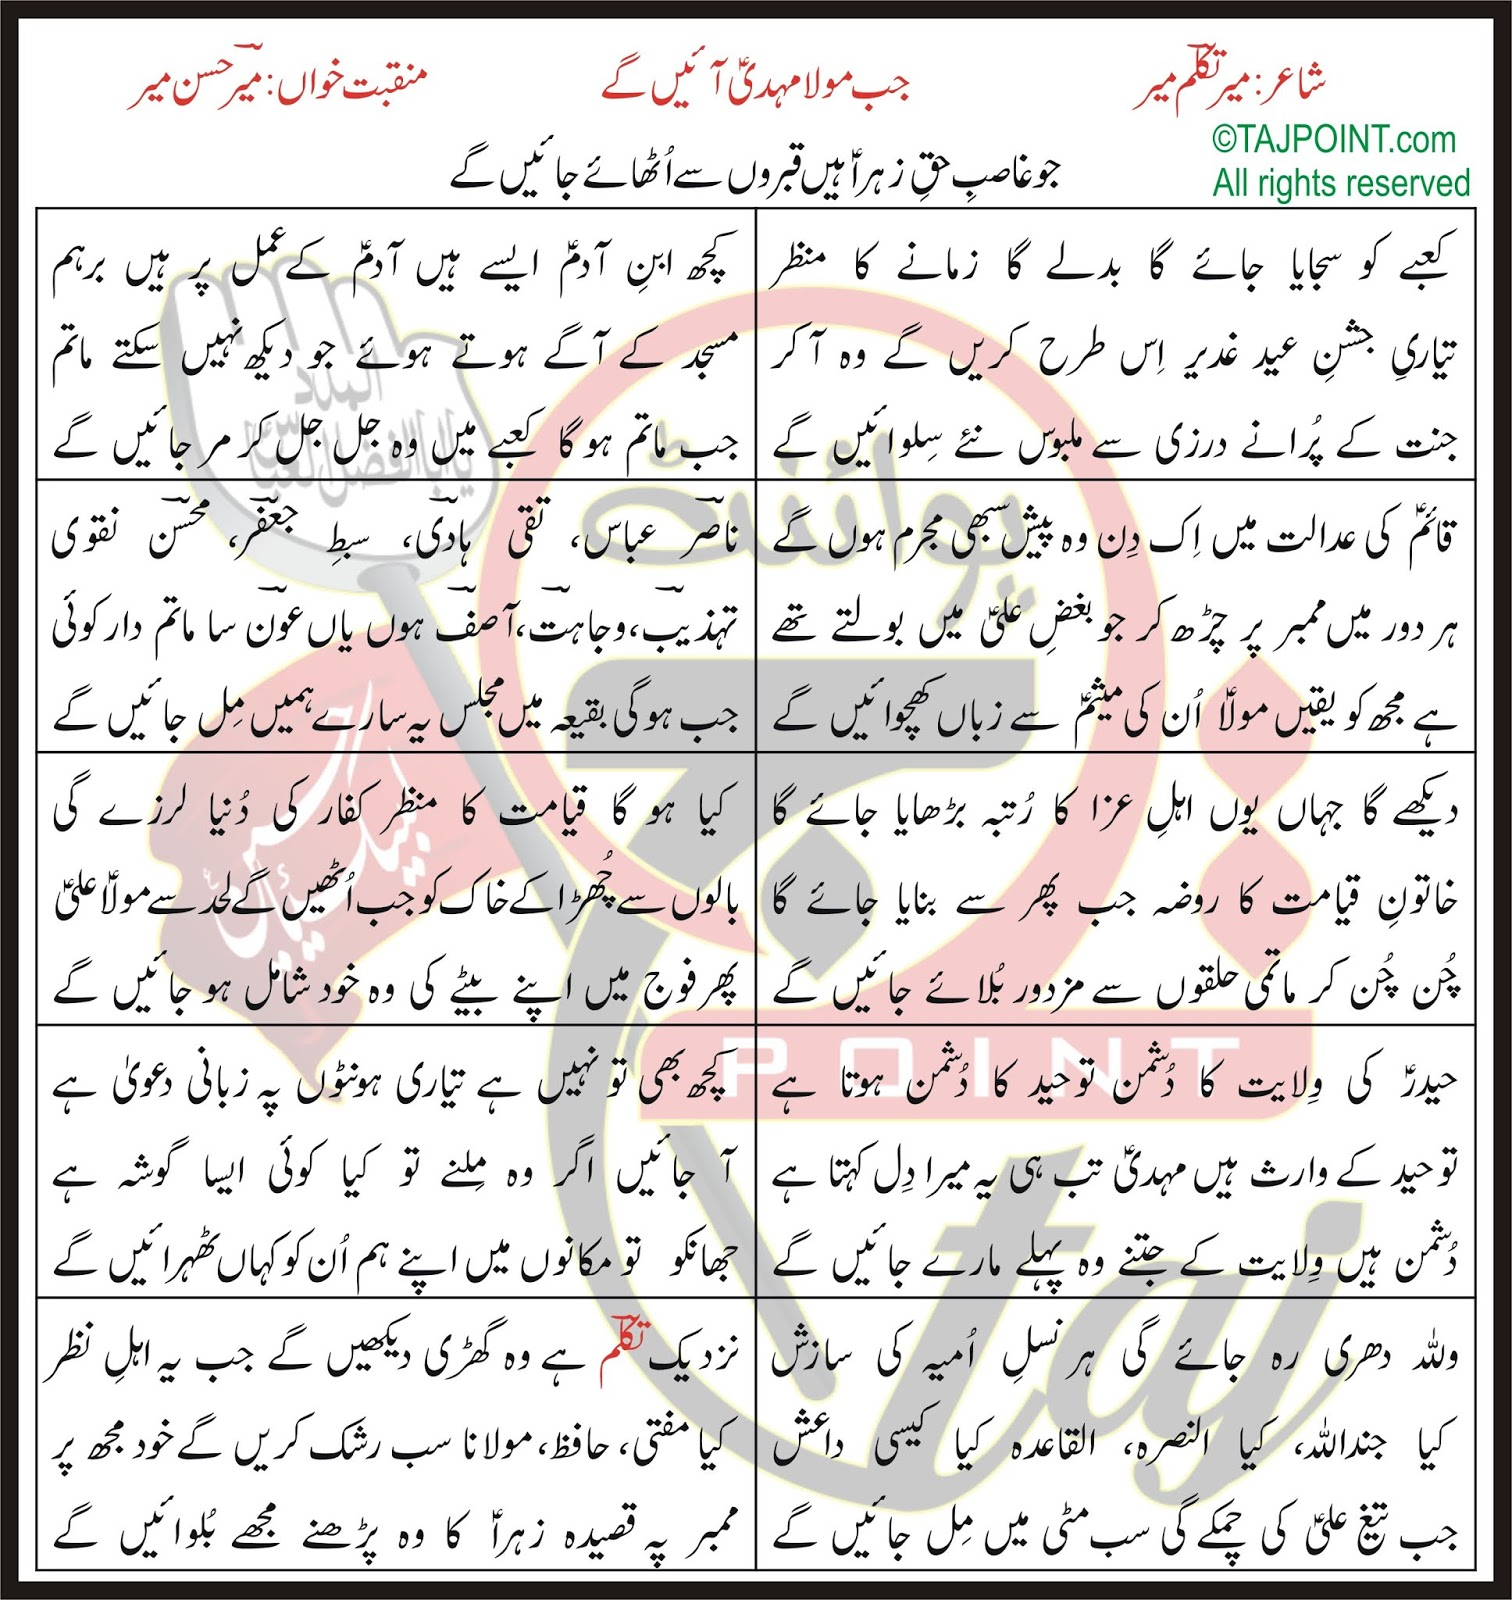 Jab Mola Mehdi Aaein Gaye Jo Ghasib-e-Haq-e-Zahr Lyrics Mir